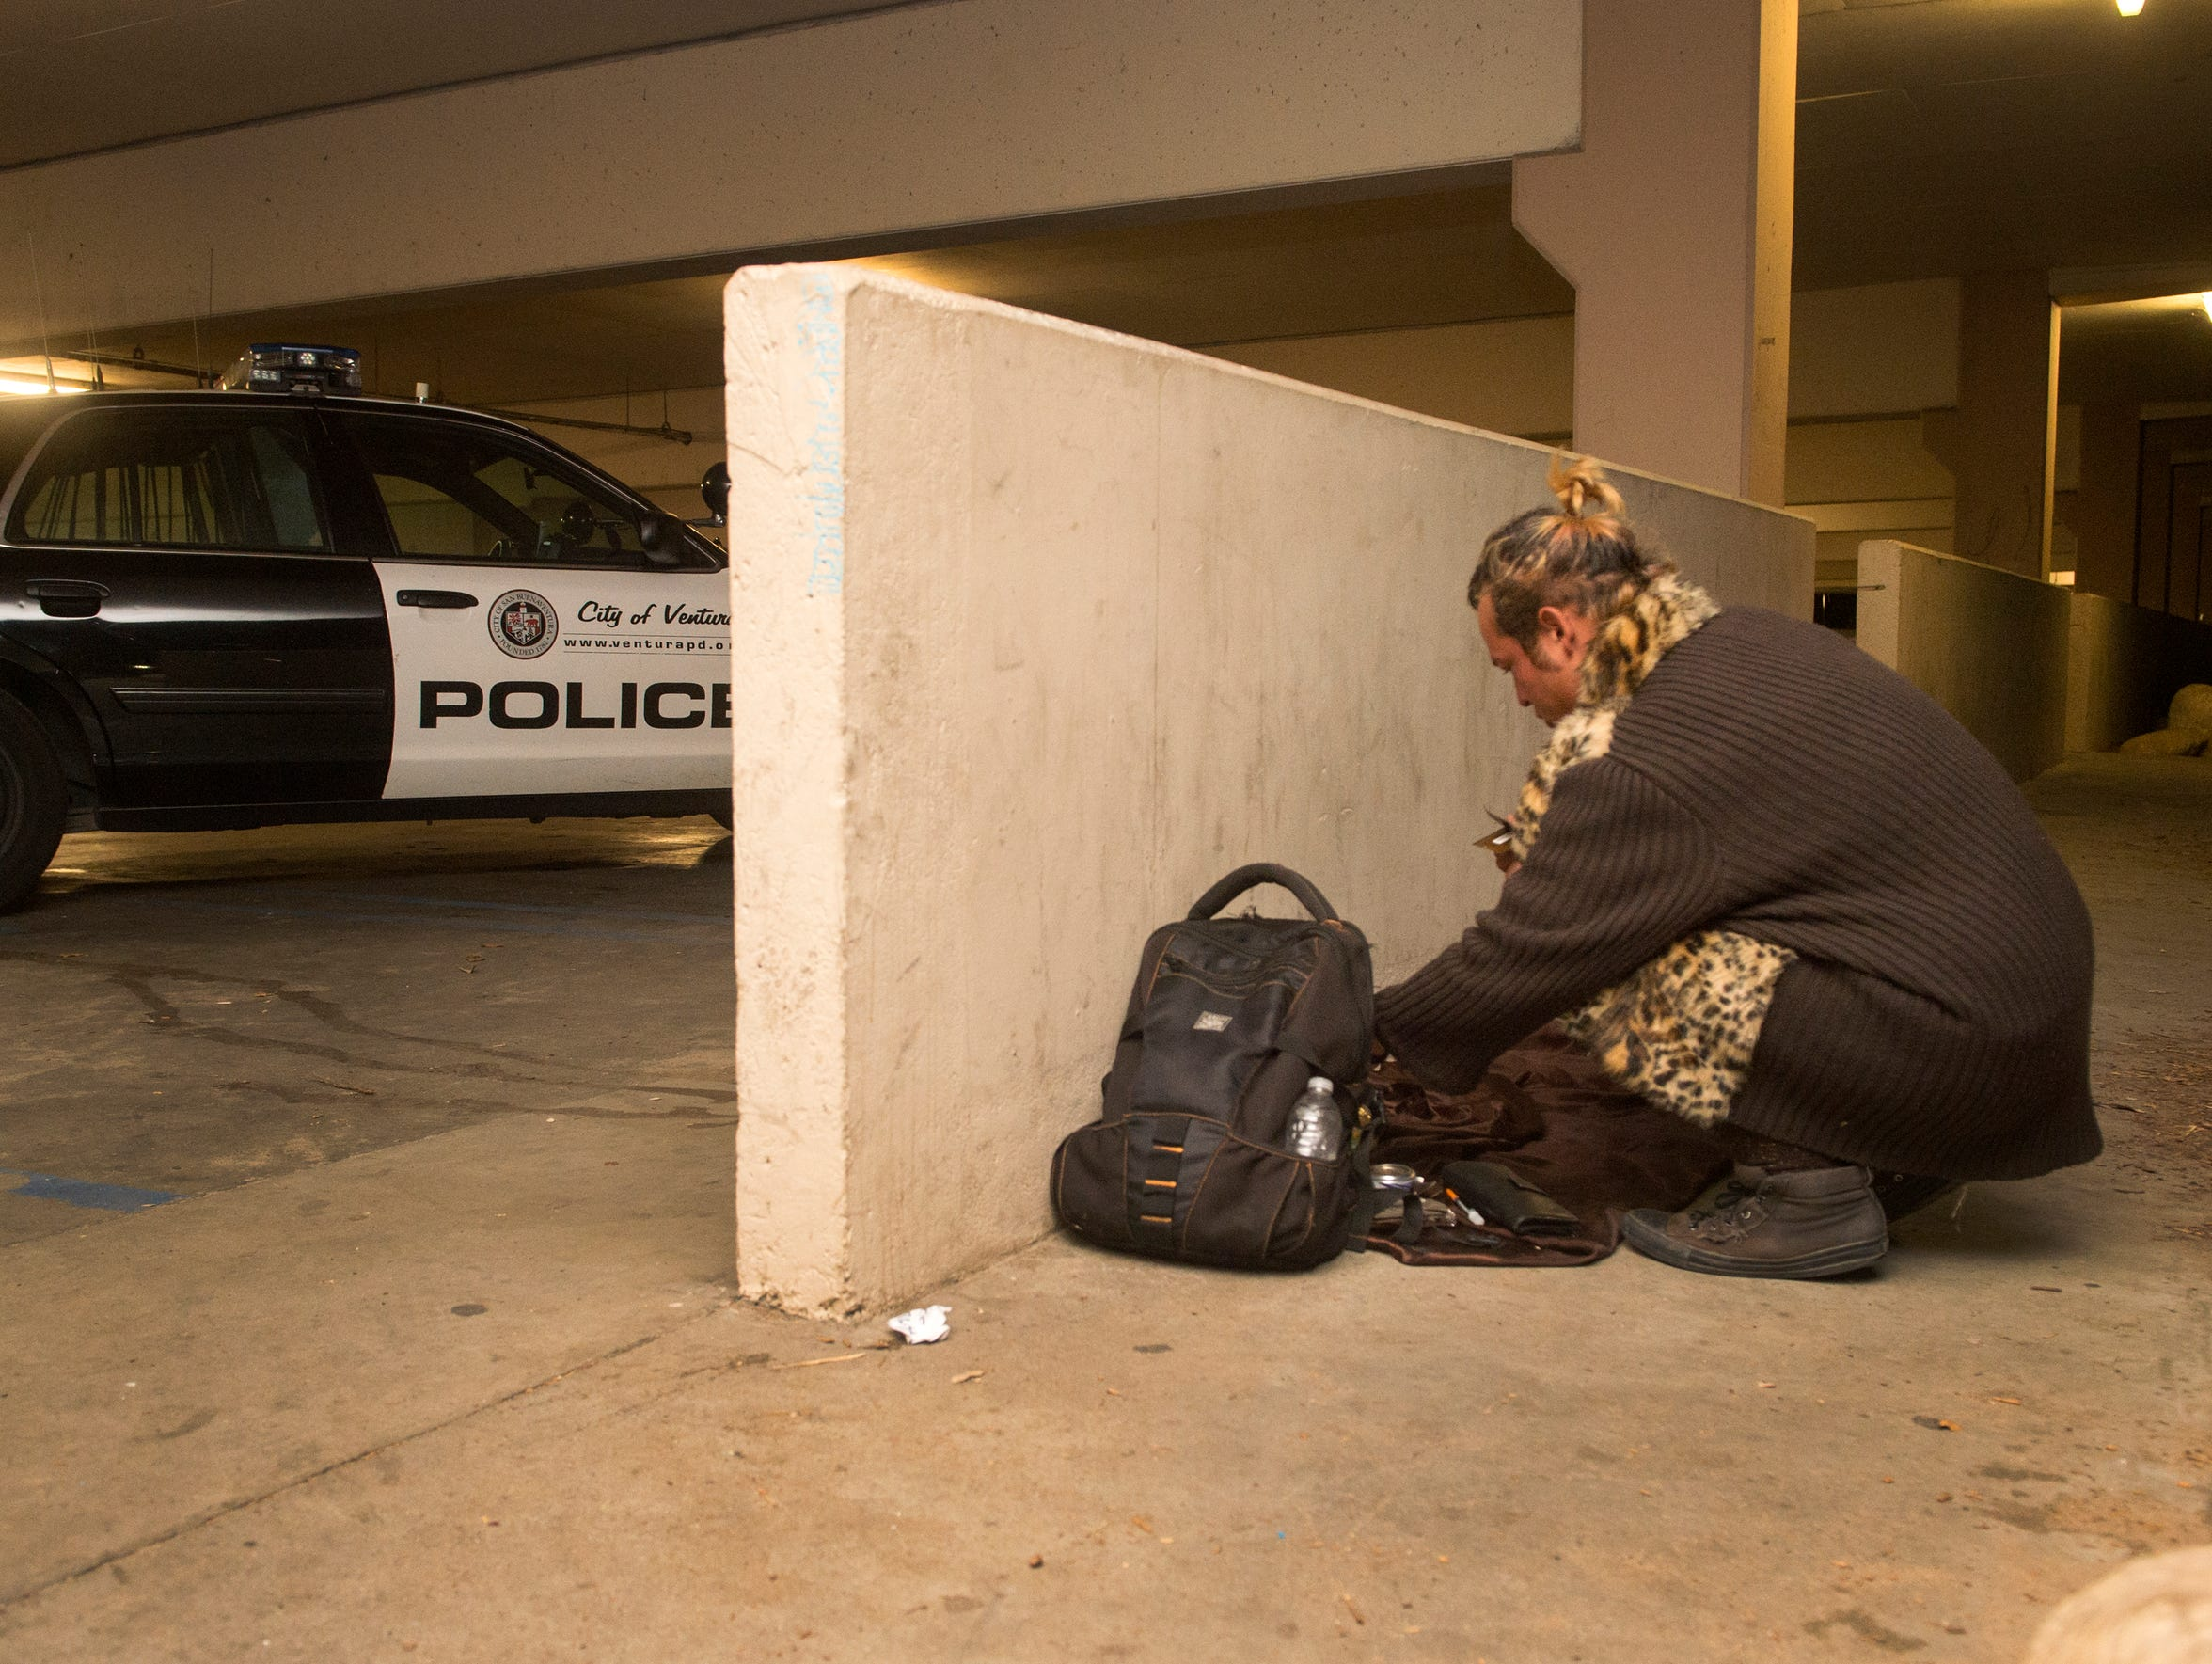 William Bennett, 31, of Ventura, packs up his belongings